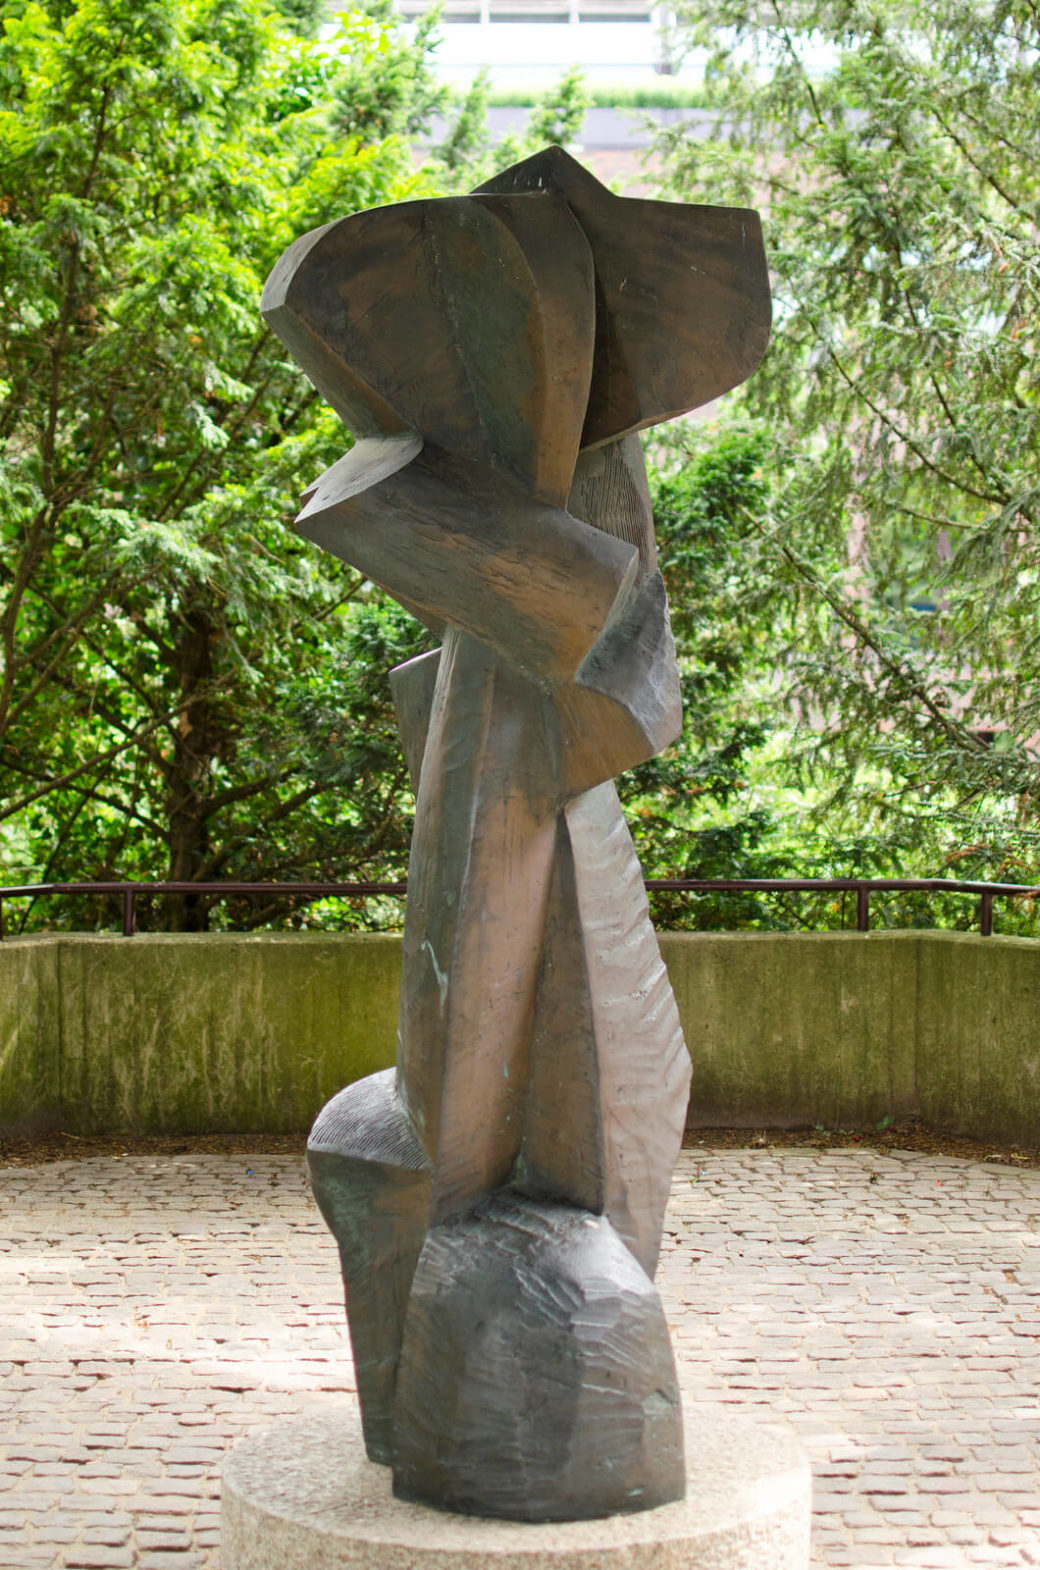 Manfred Sihle-Wissel: Stele vor dem Rathaus Itzehoe, (Foto: KUNST@SH/Jan Petersen)